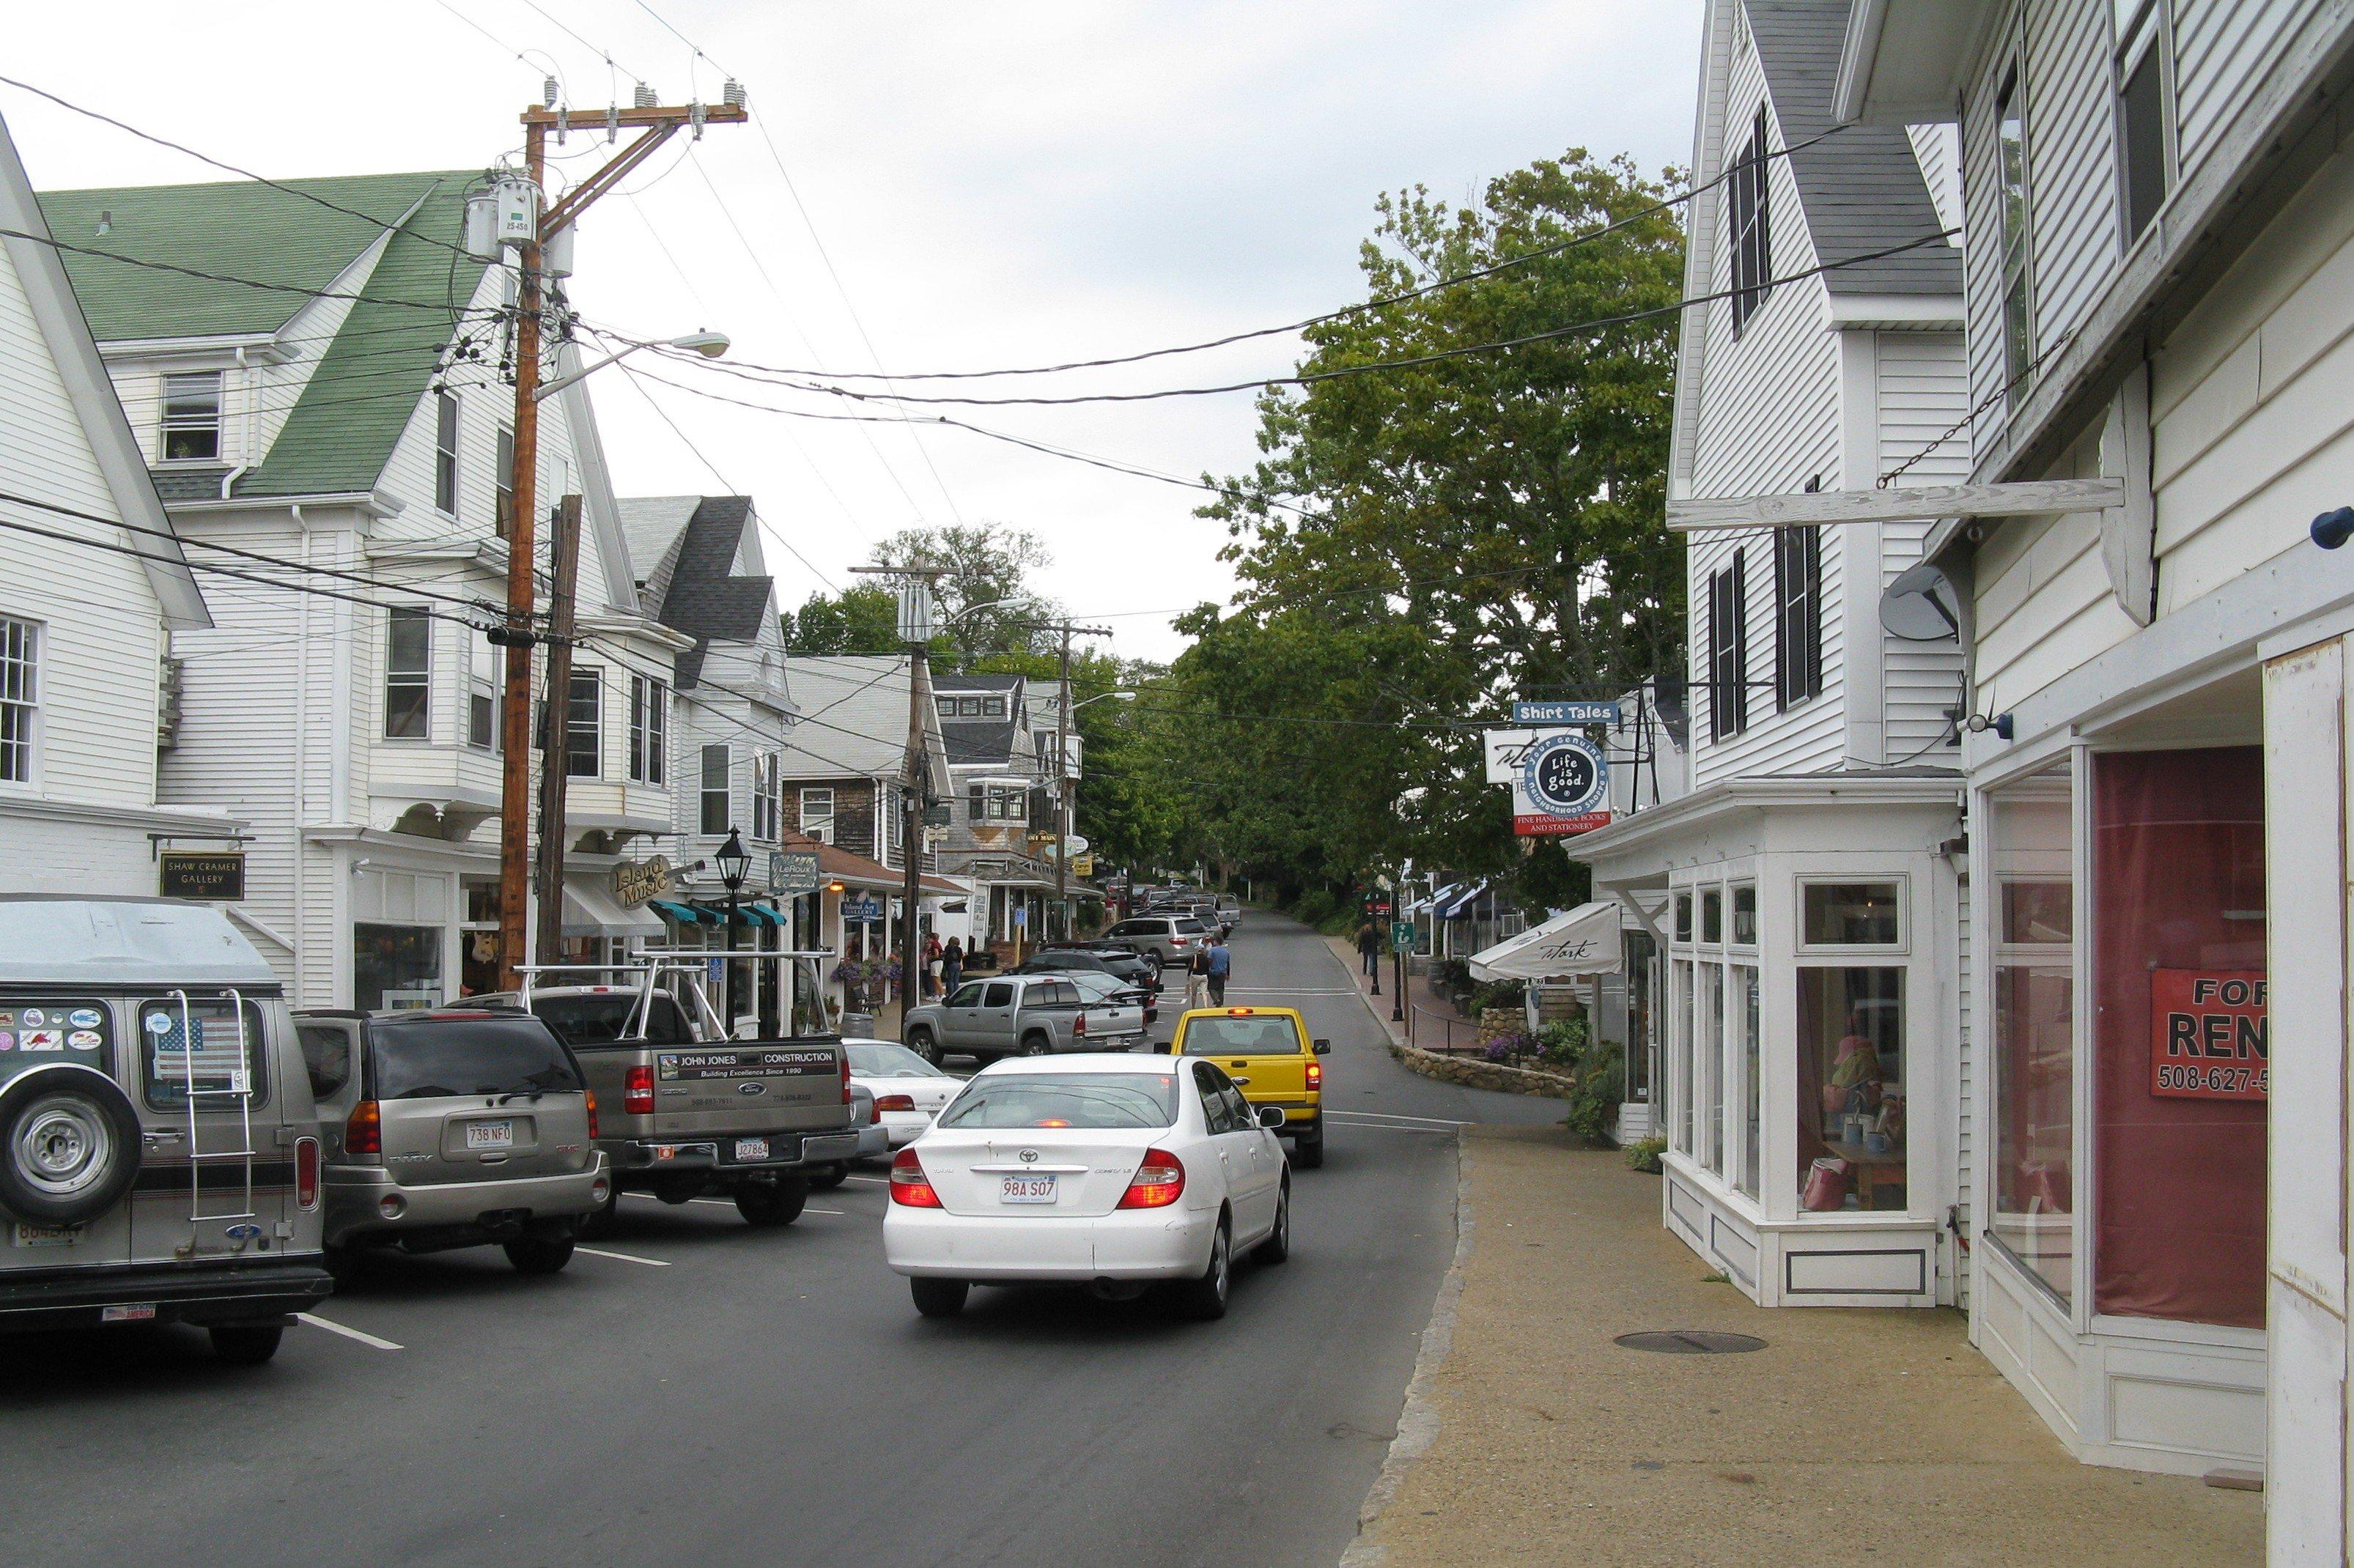 About Vineyard Haven Massachusetts